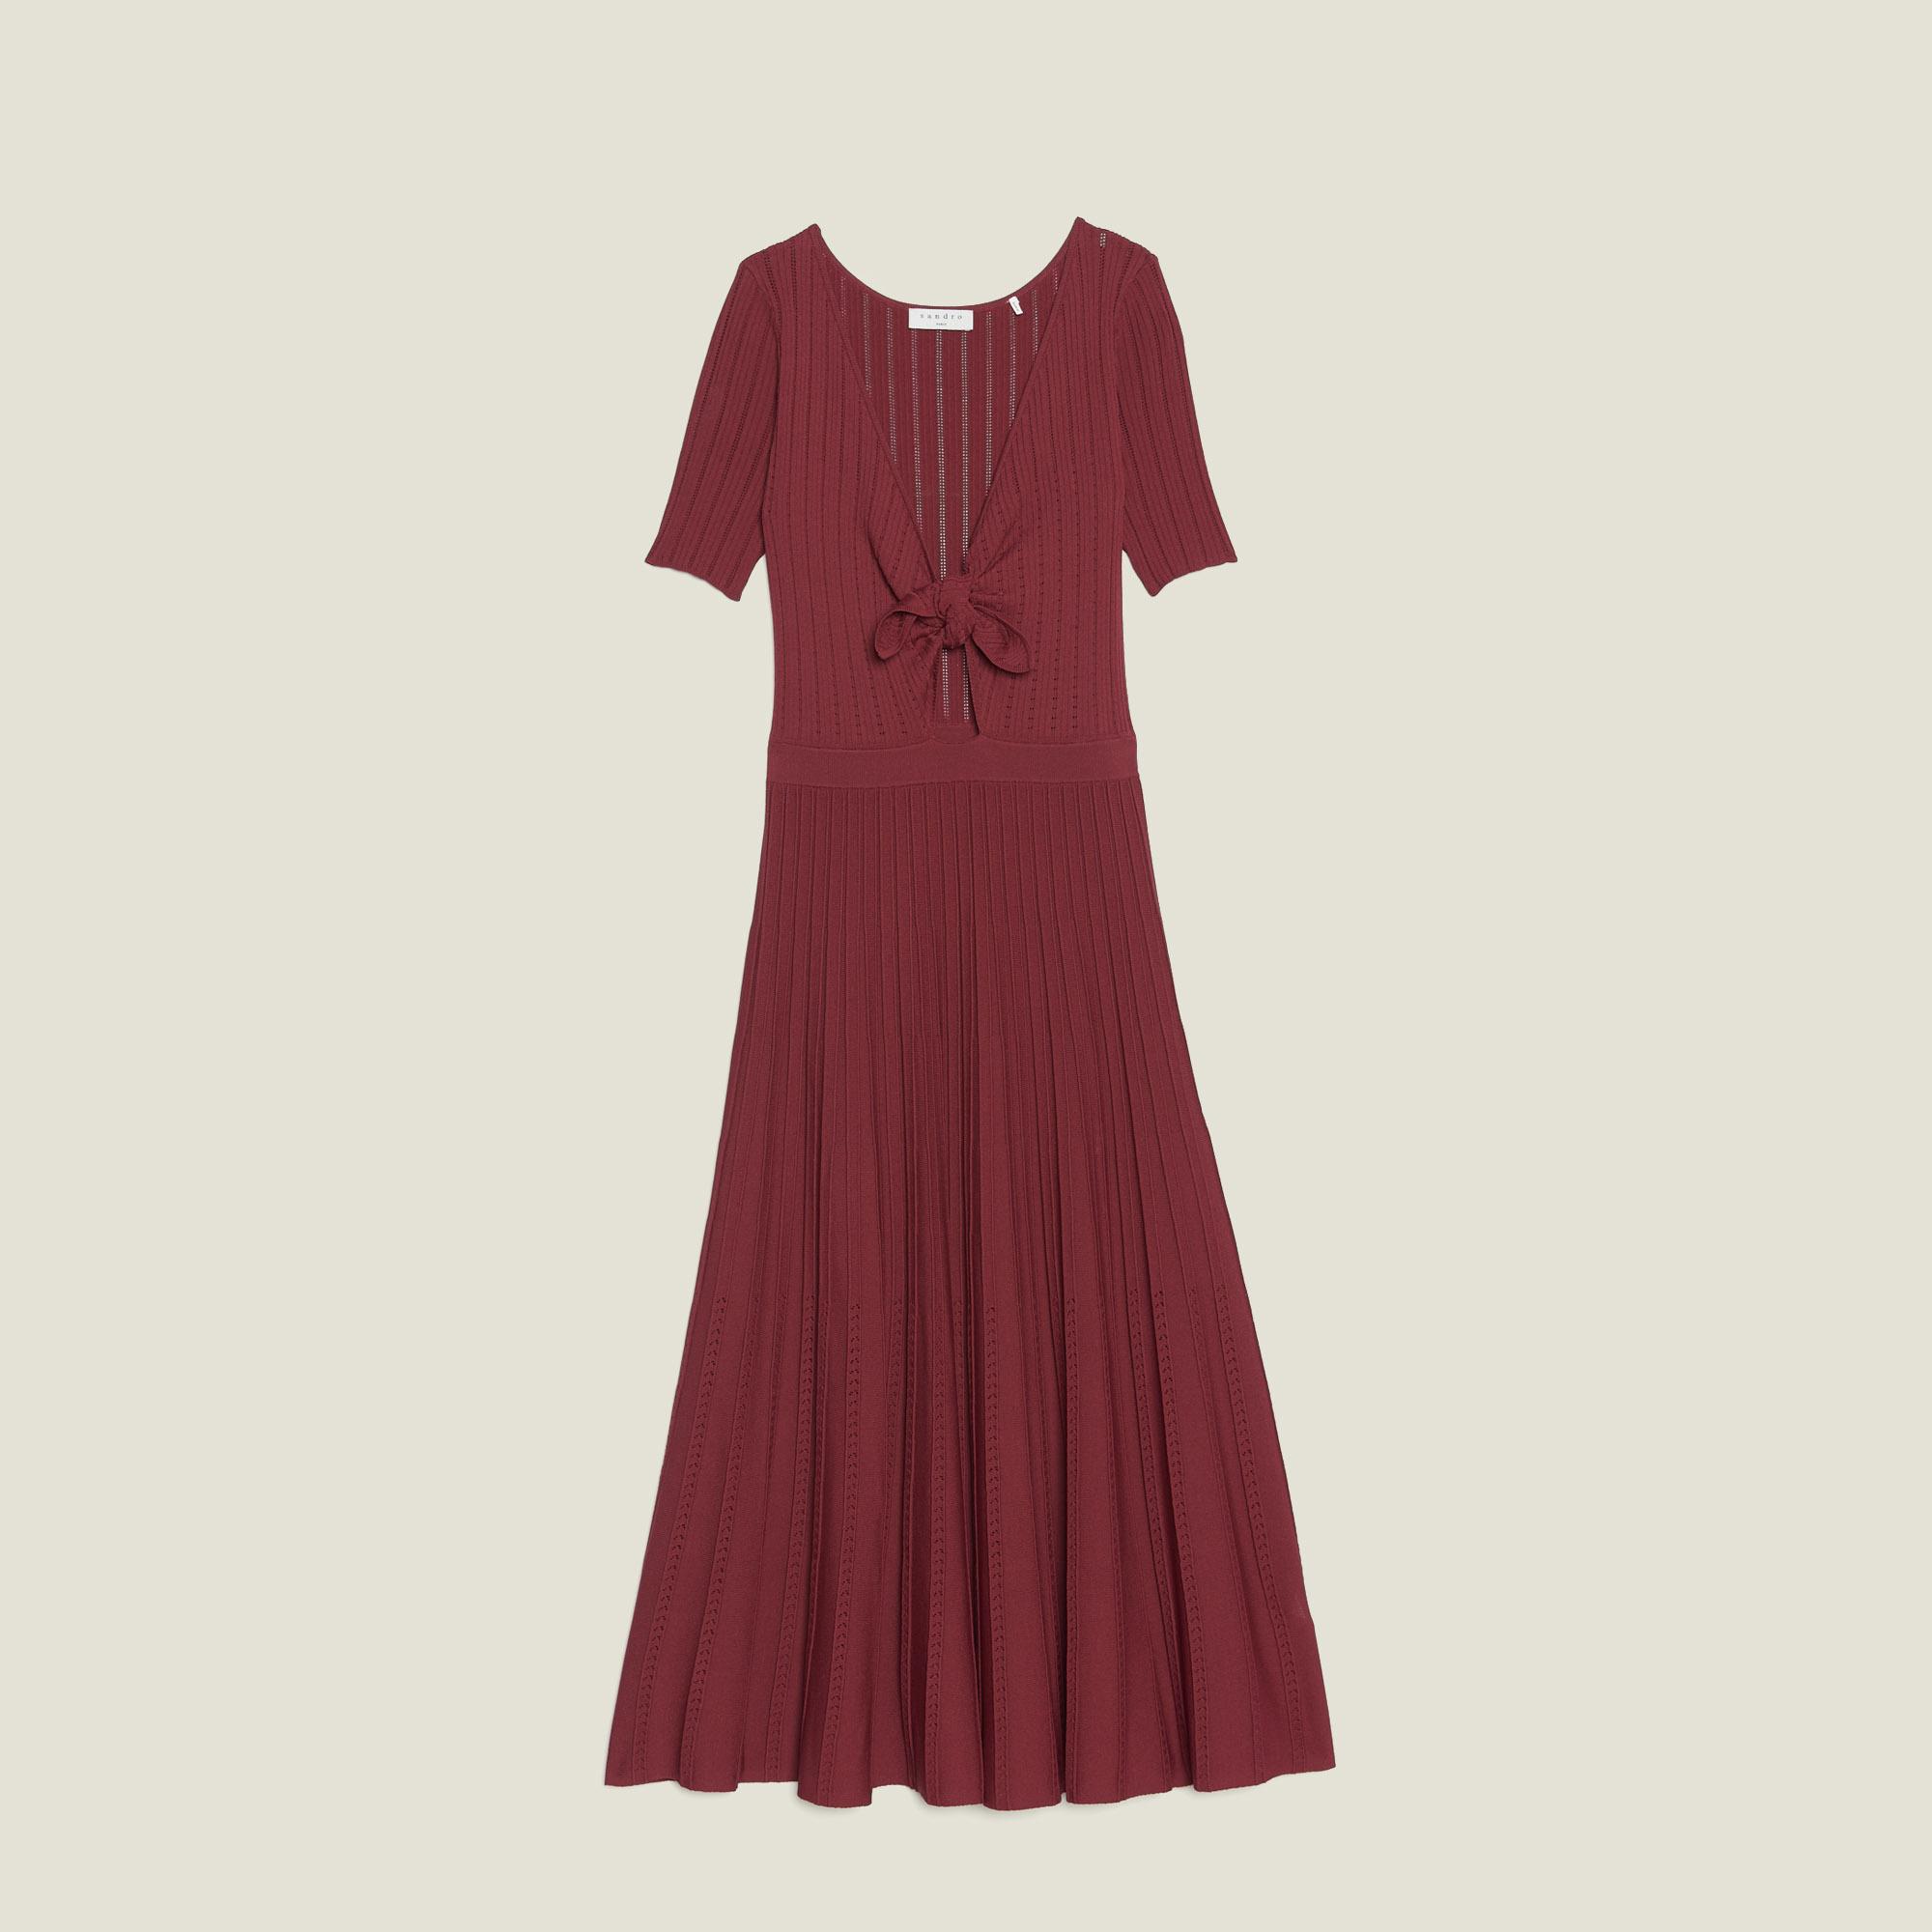 5c41481bd0c ... Openwork Knit Midi Dress   Dresses color Land of Fire